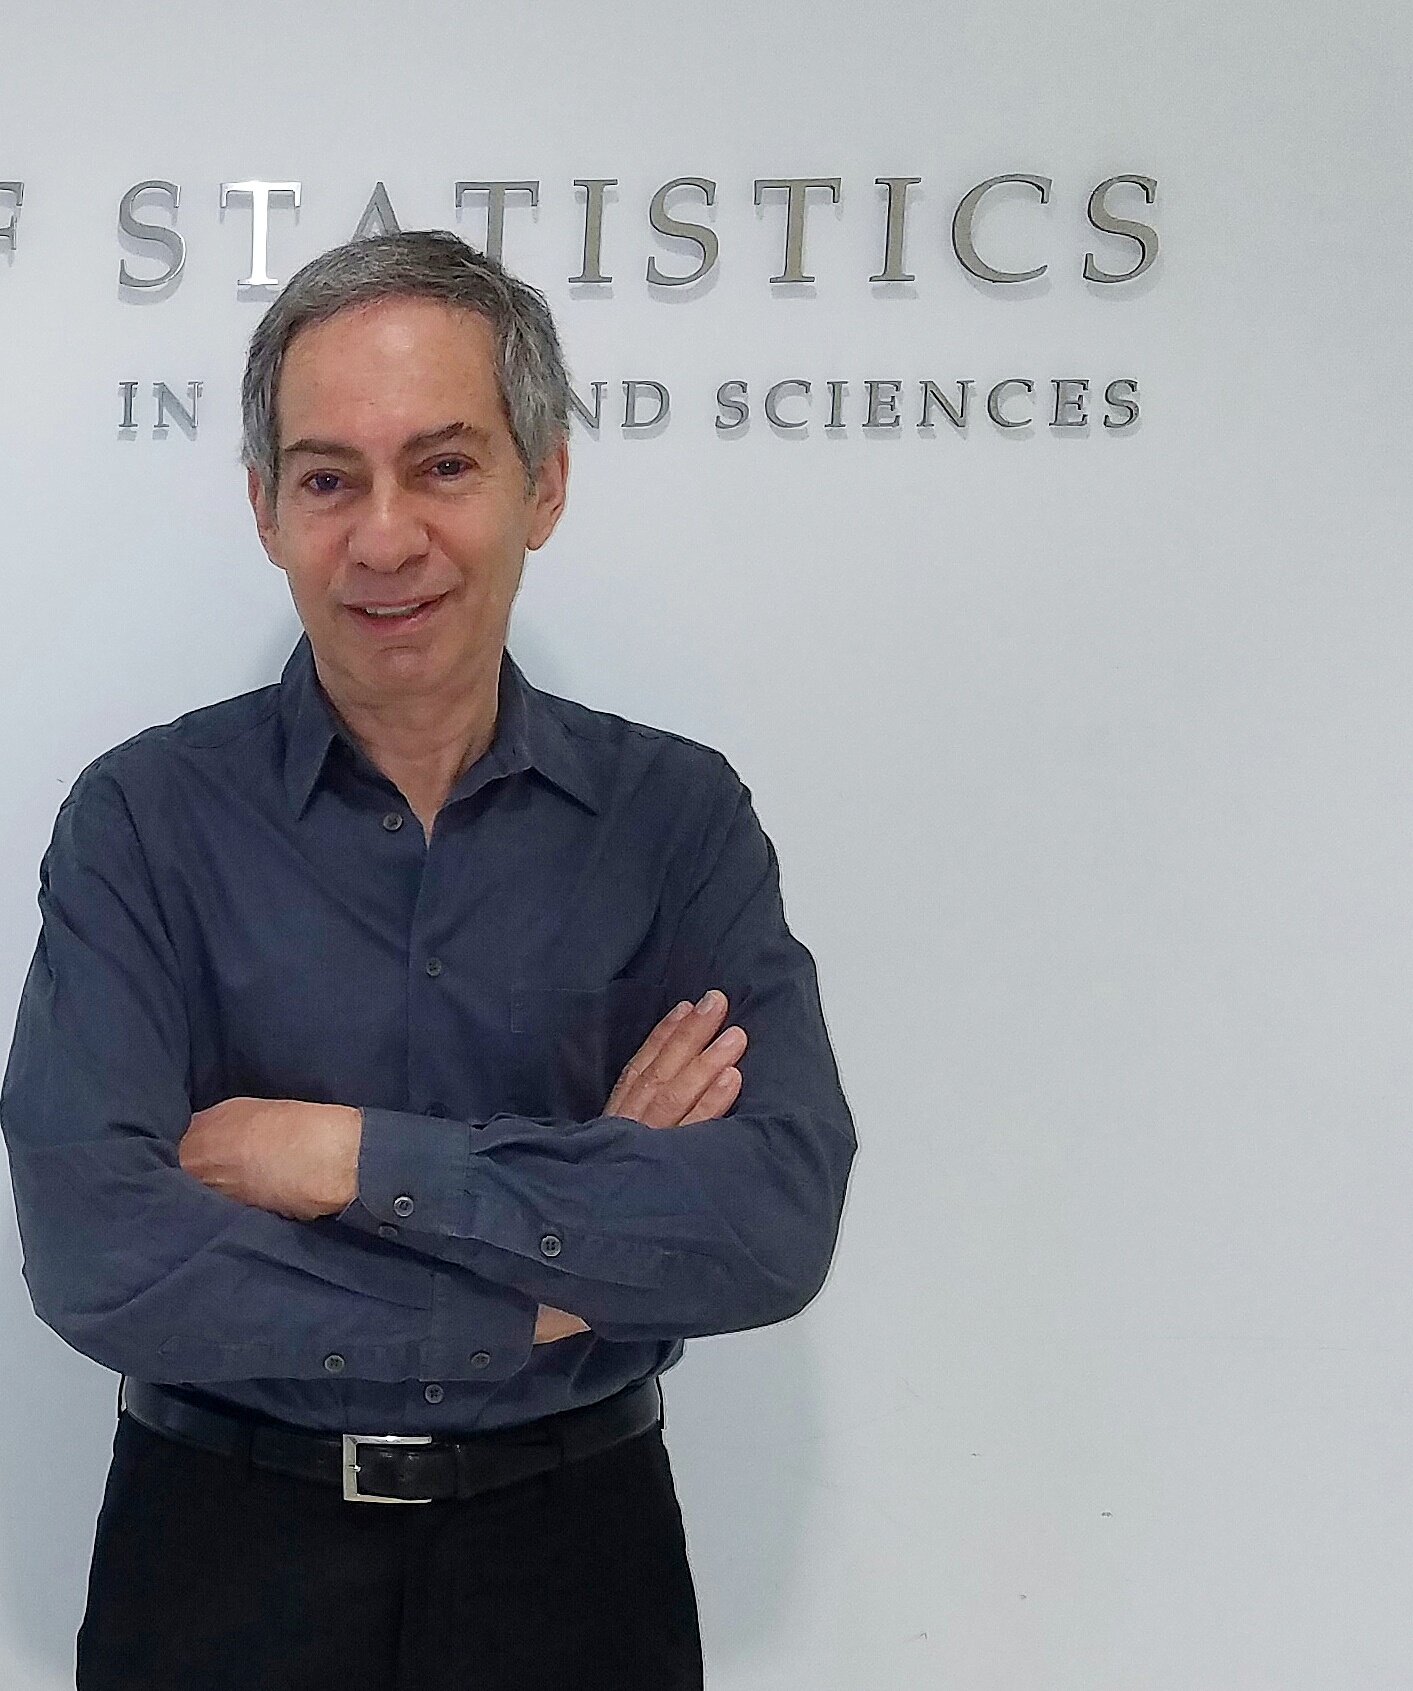 Professor Michael E. Sobel, 2017